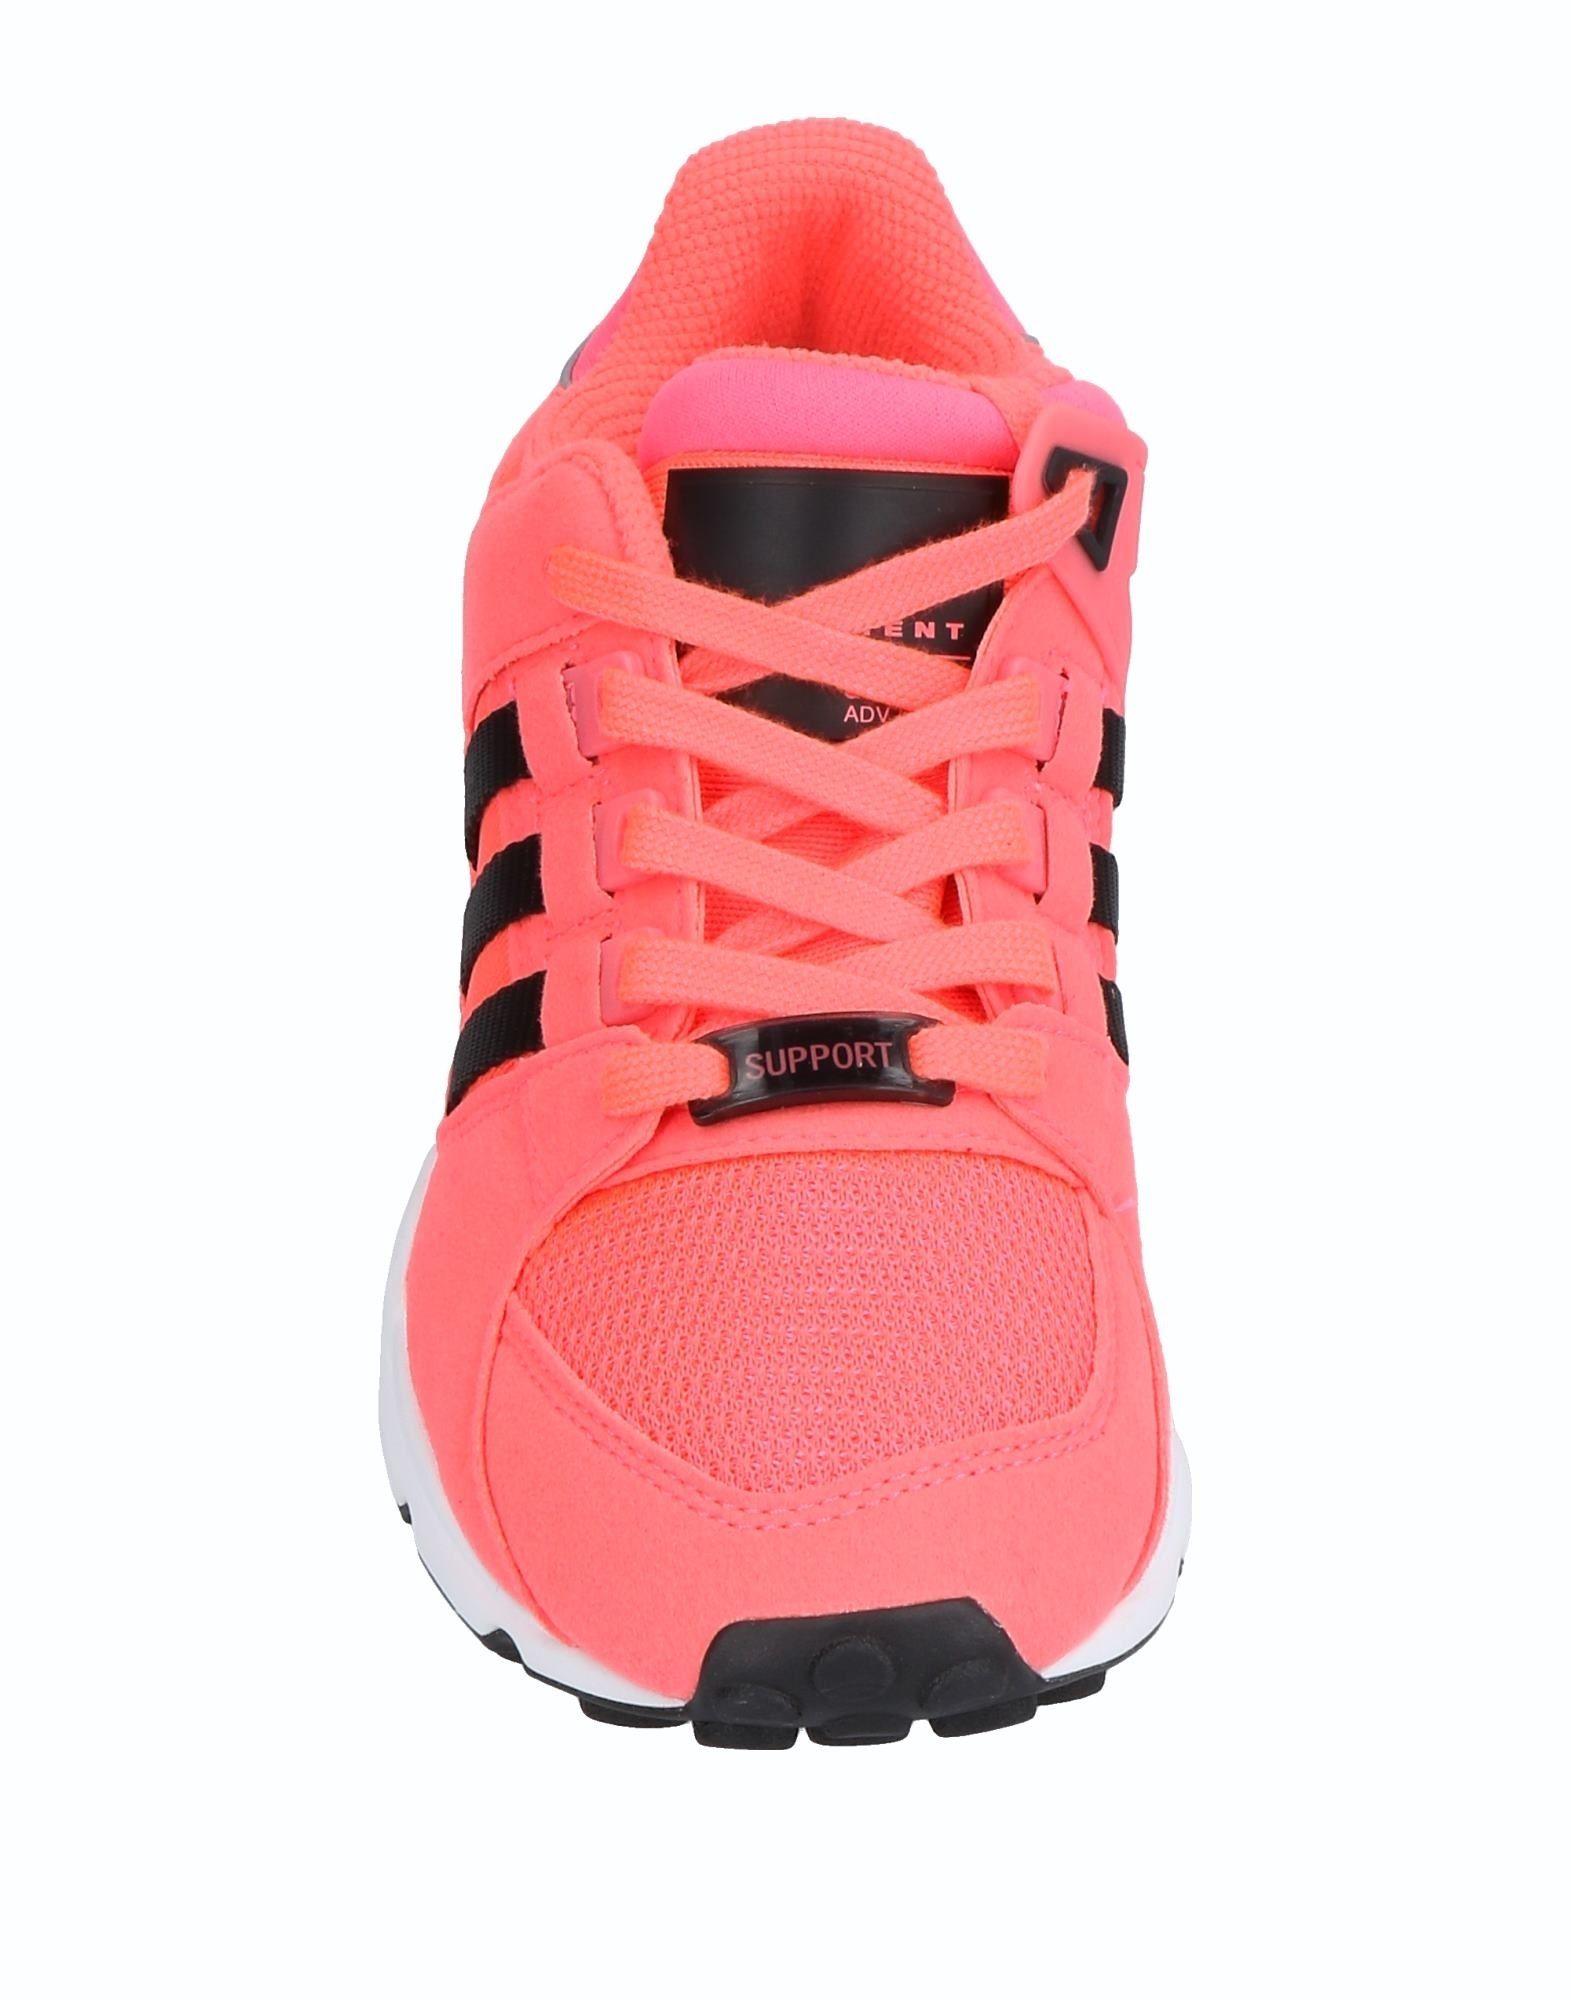 Rabatt Adidas echte Schuhe Adidas Rabatt Originals Turnschuhes Herren 11506129GW dcc314